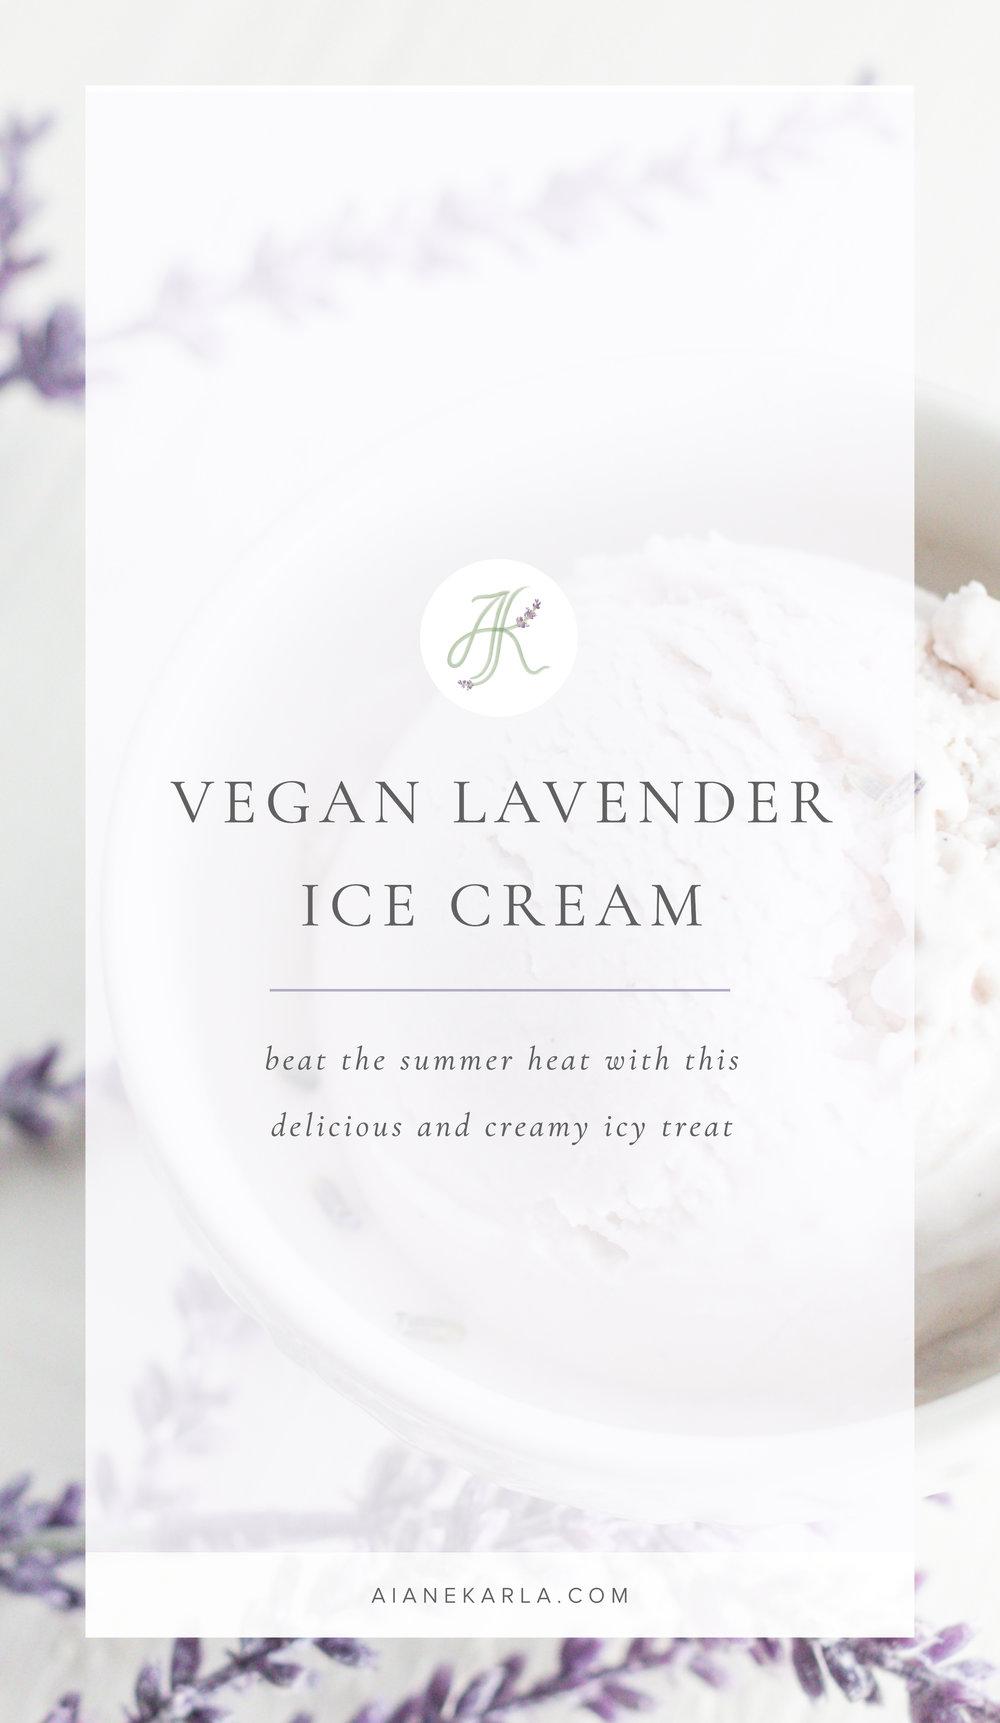 Vegan Lavender Ice Cream | Aiane Karla | www.aianekarla.com